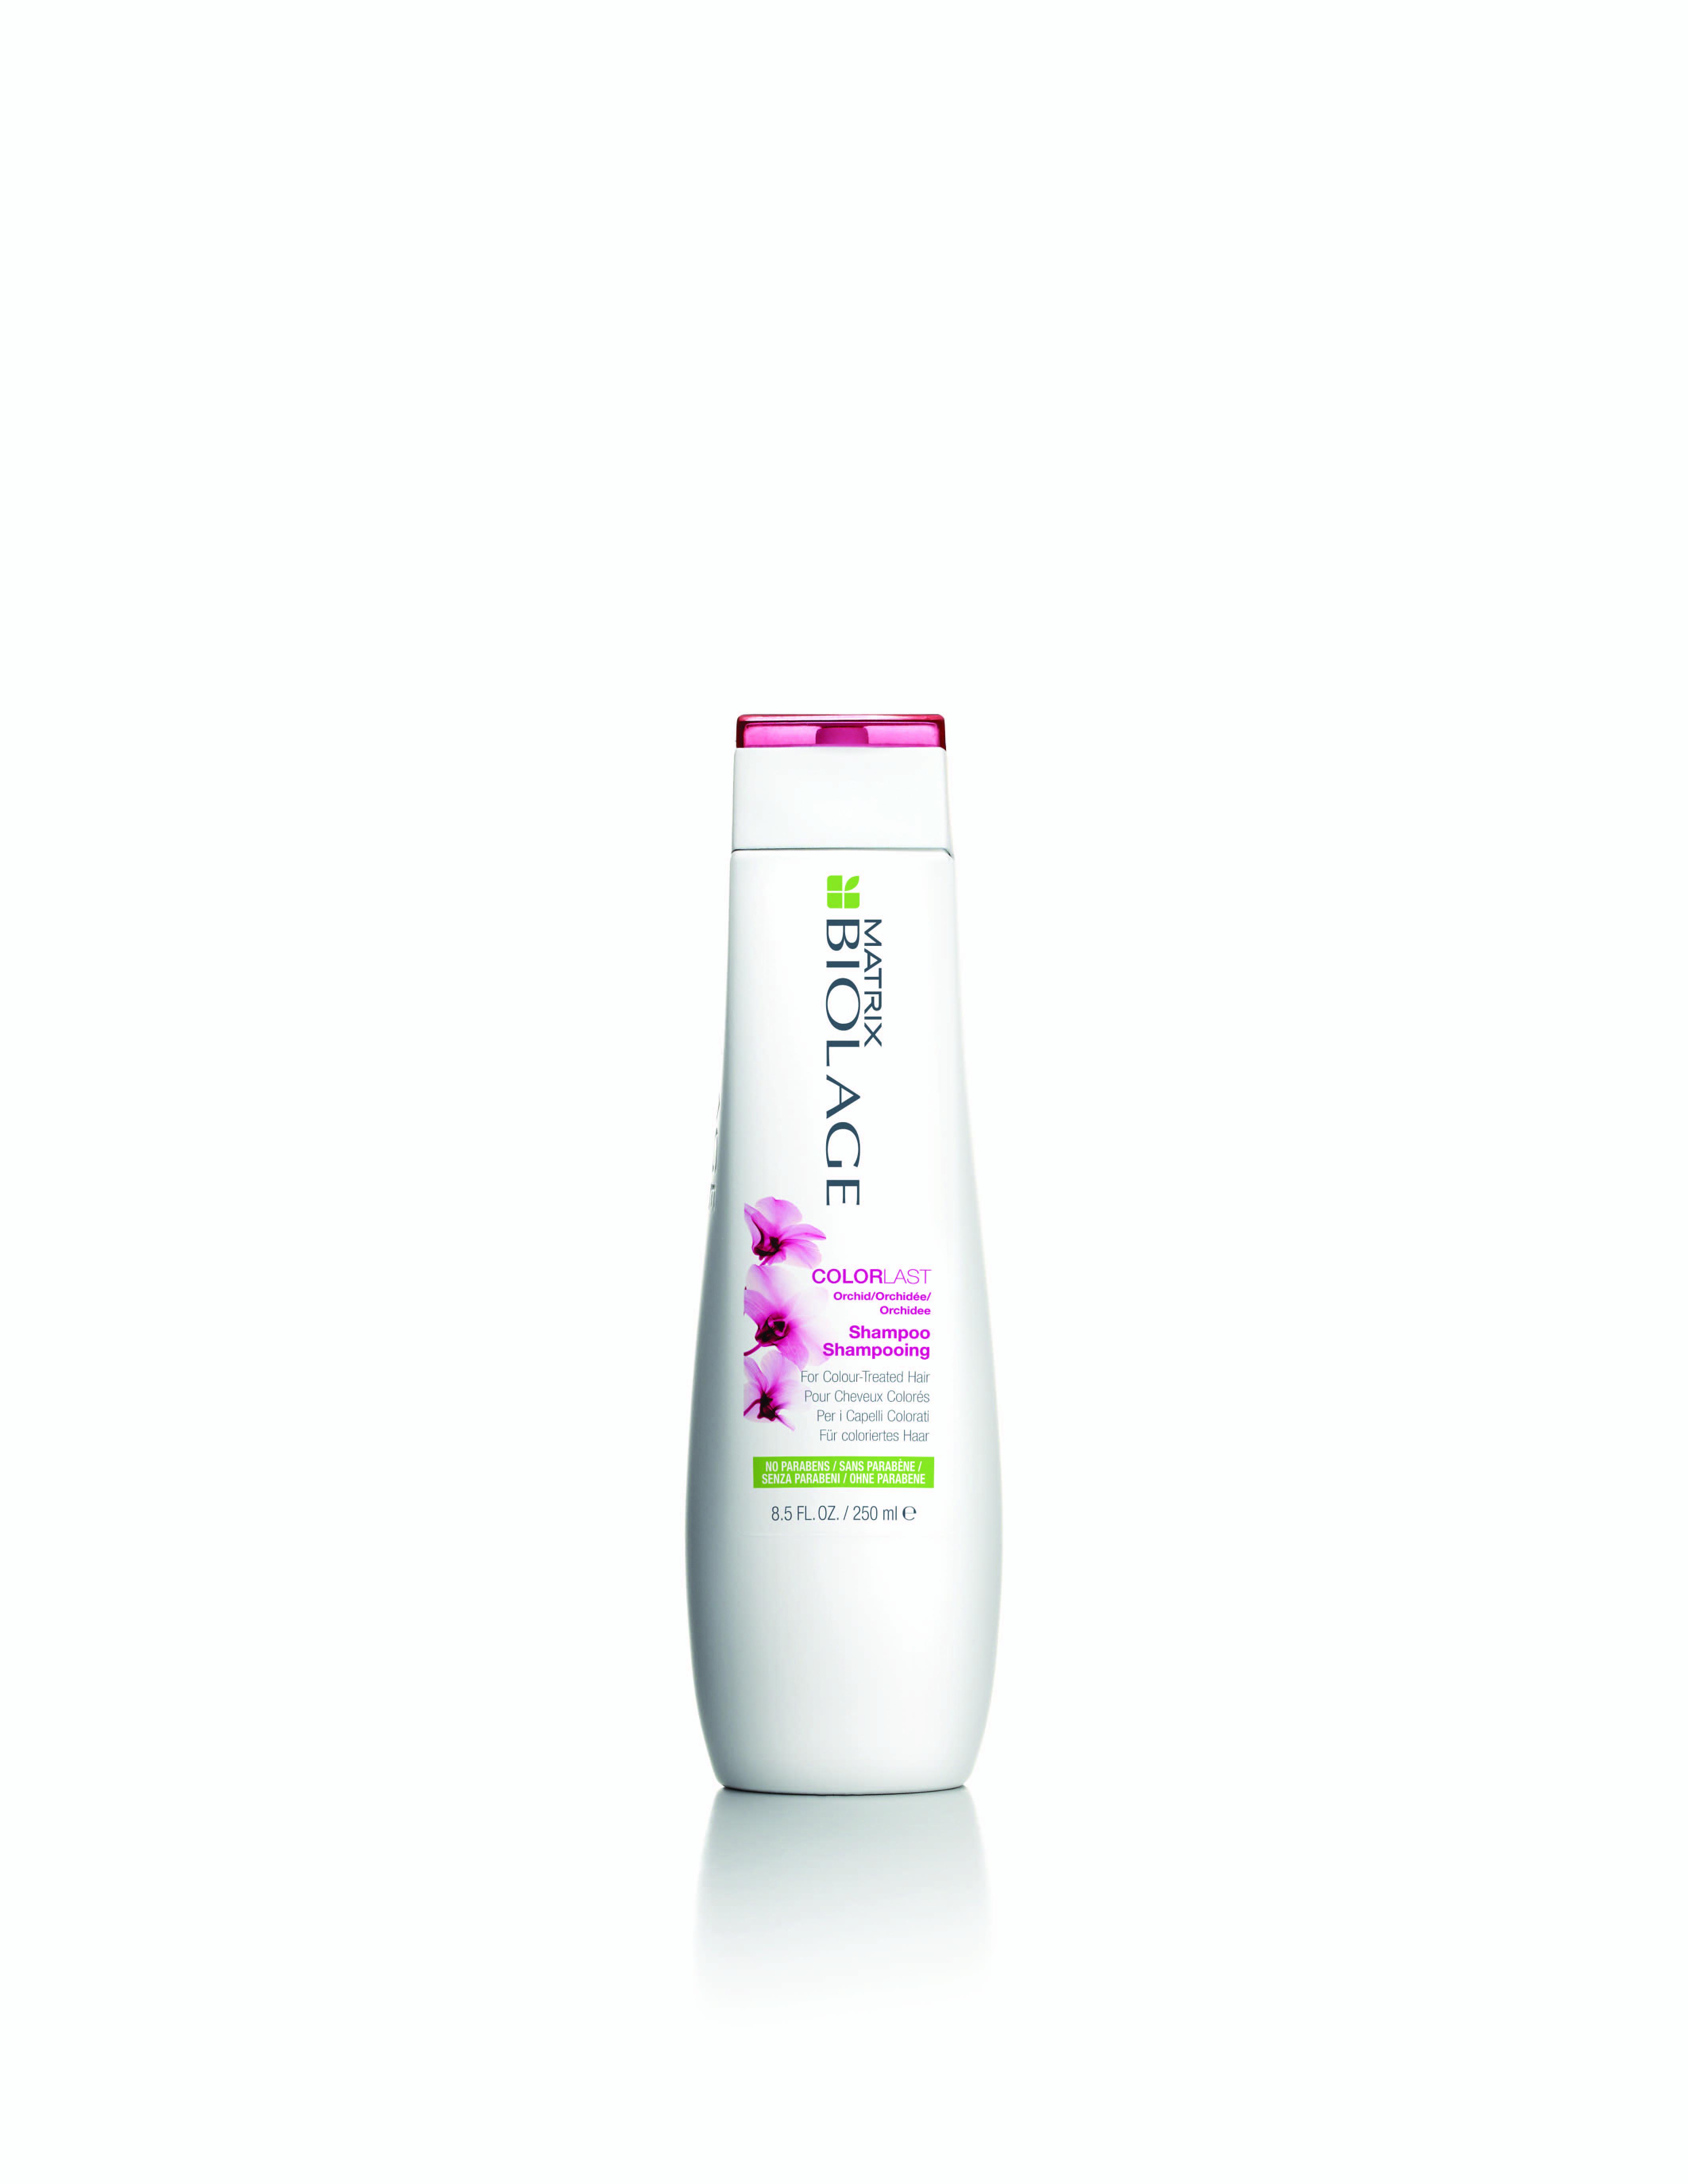 Matrix Bio ColorLast Shampoo 189 kr